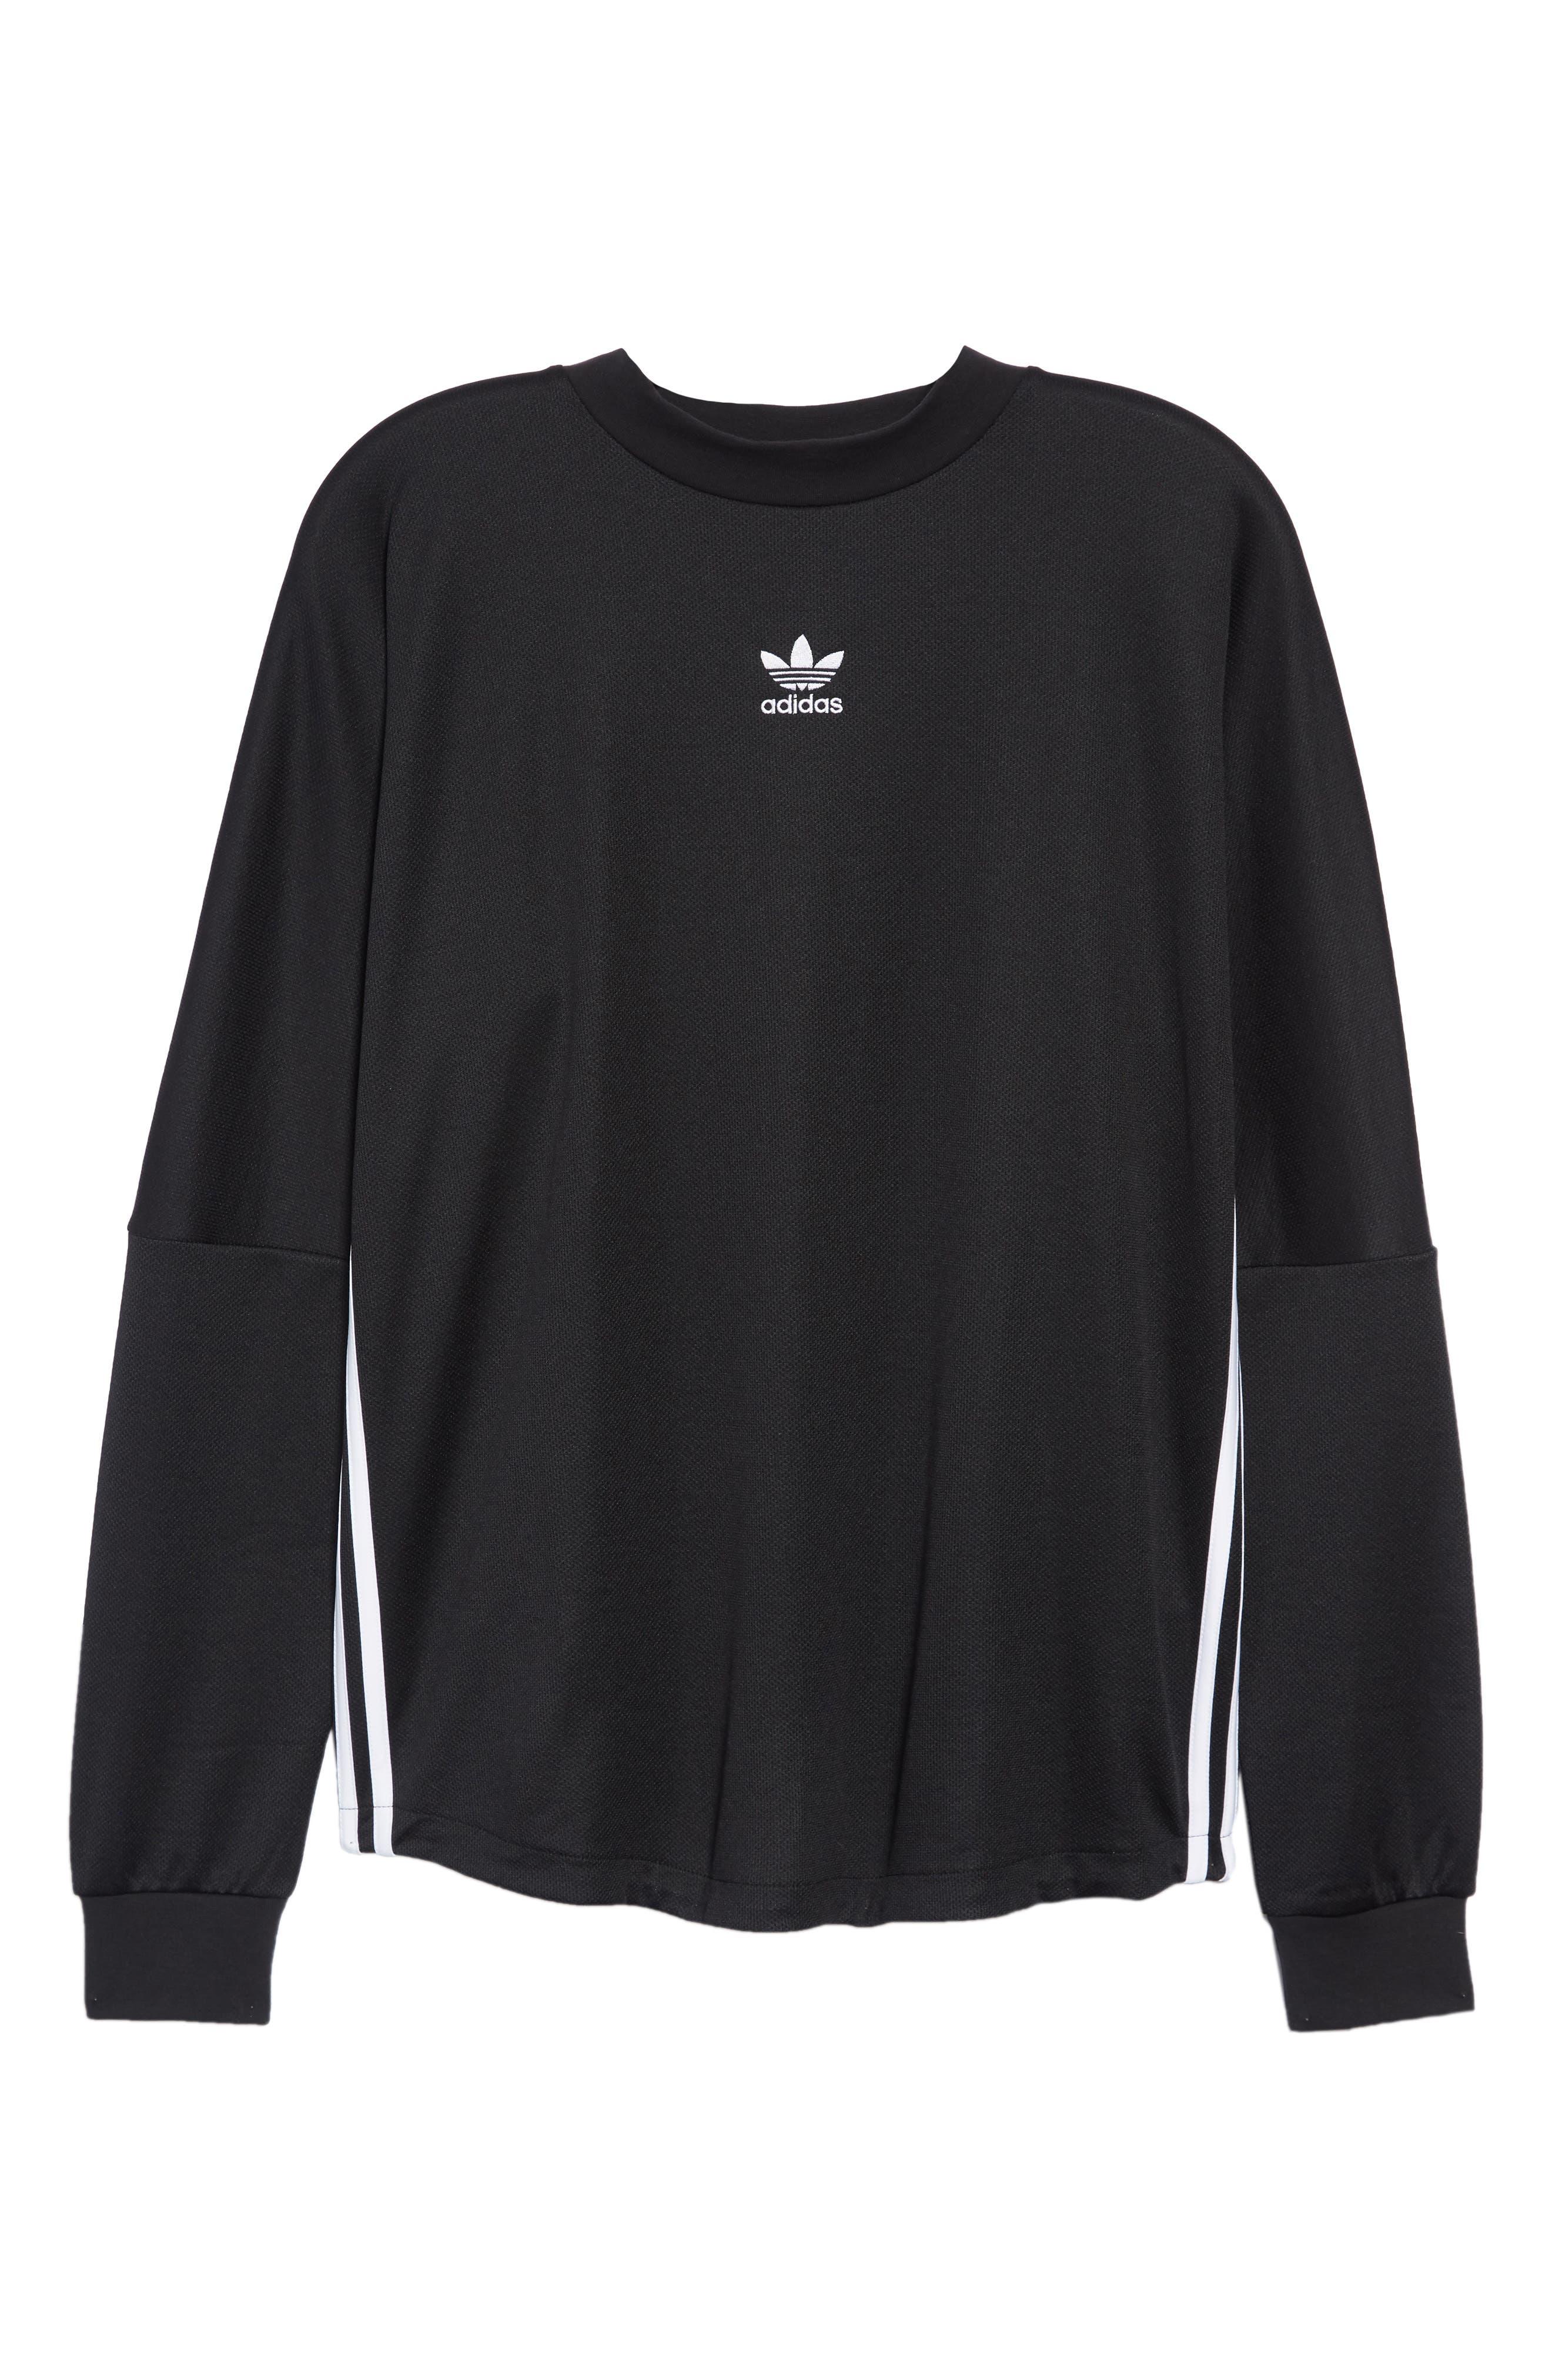 Authentics Long Sleeve Goalie Shirt,                             Alternate thumbnail 6, color,                             BLACK/ WHITE